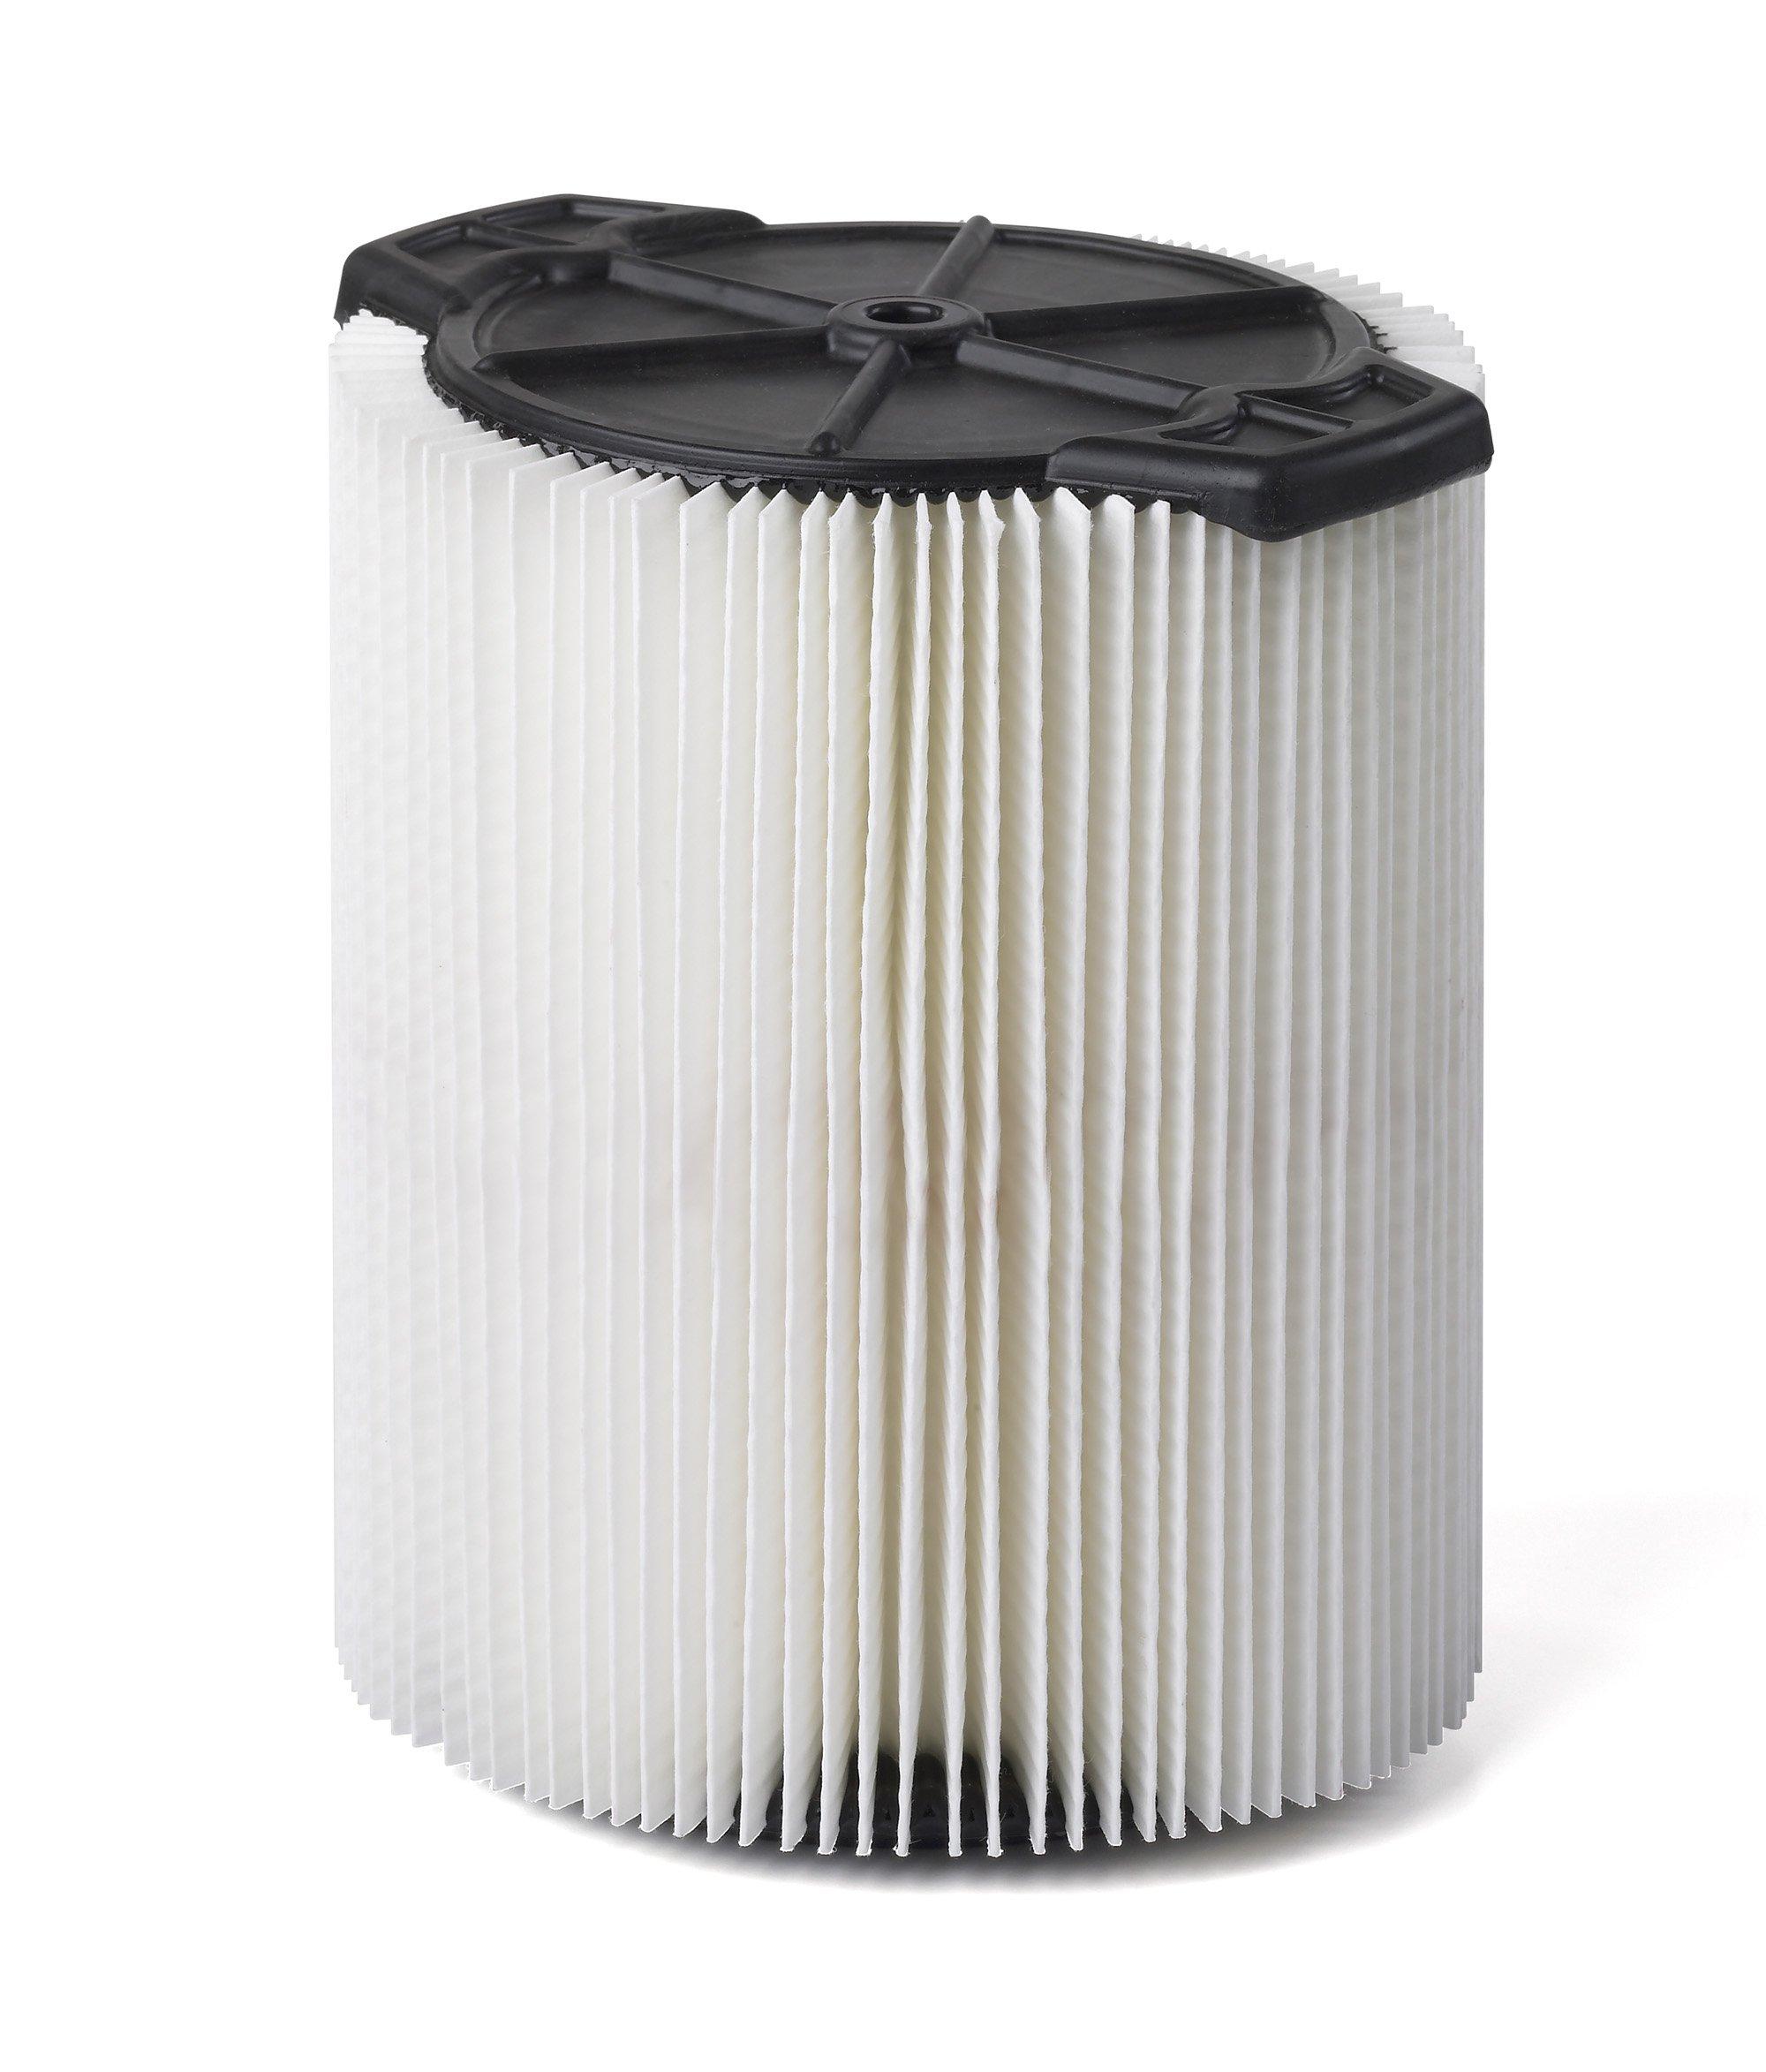 Multi-Fit Wet Dry Vac Filter VF7816 Standard Wet Dry Vacuum Filter by WORKSHOP Wet/Dry Vacs